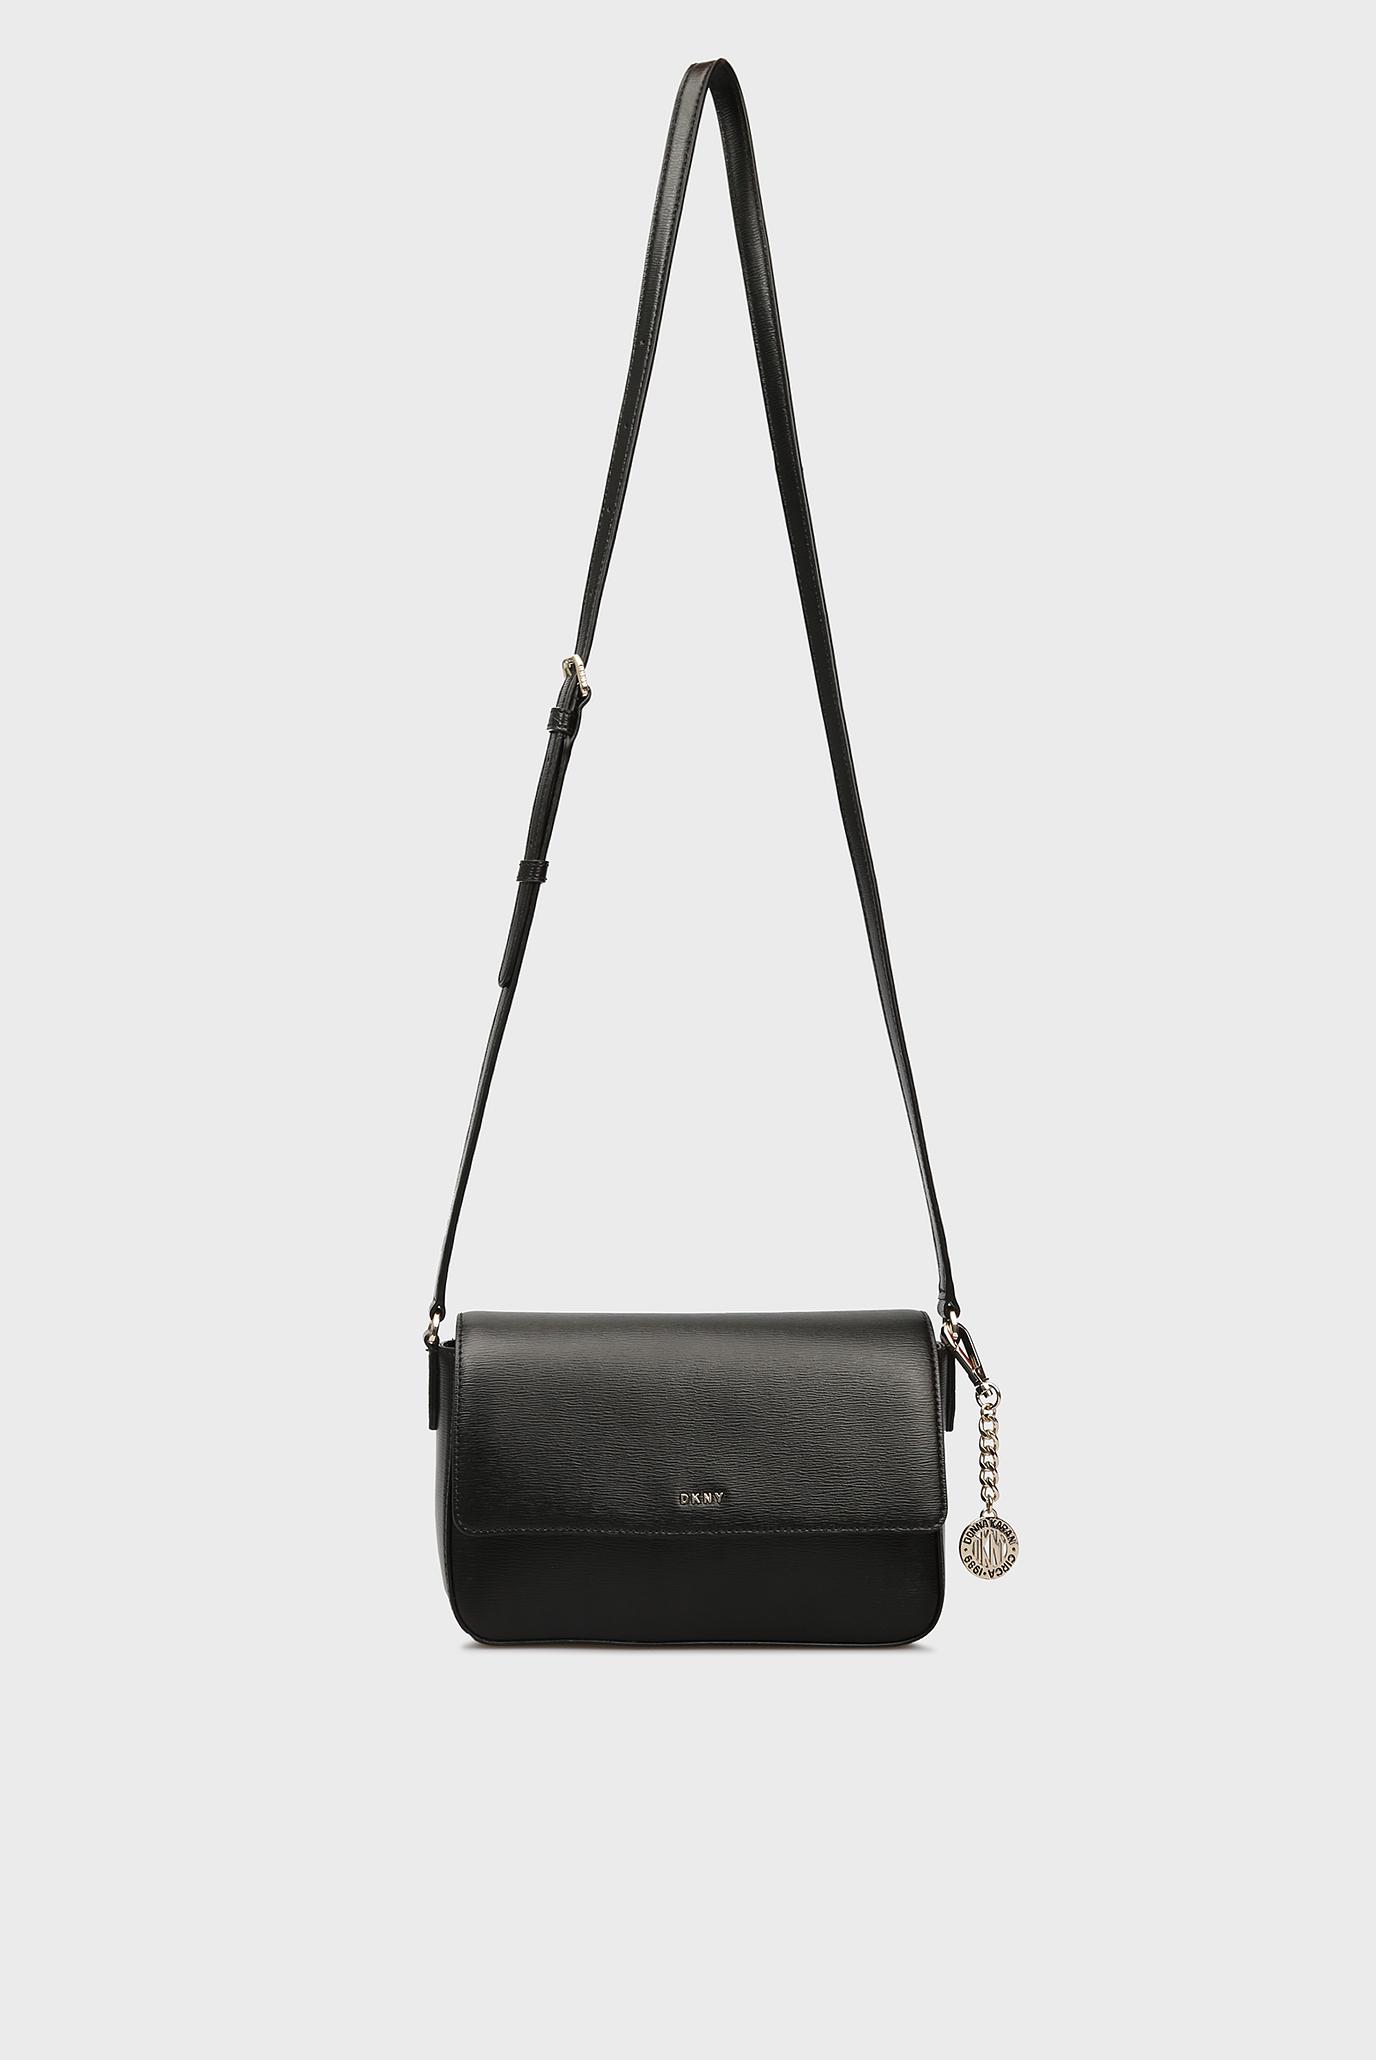 12ccdb7b28c2 Купить Женская черная сумка через плечо BRYANT-MD DKNY DKNY R82E3467 – Киев,  Украина. Цены в интернет ...